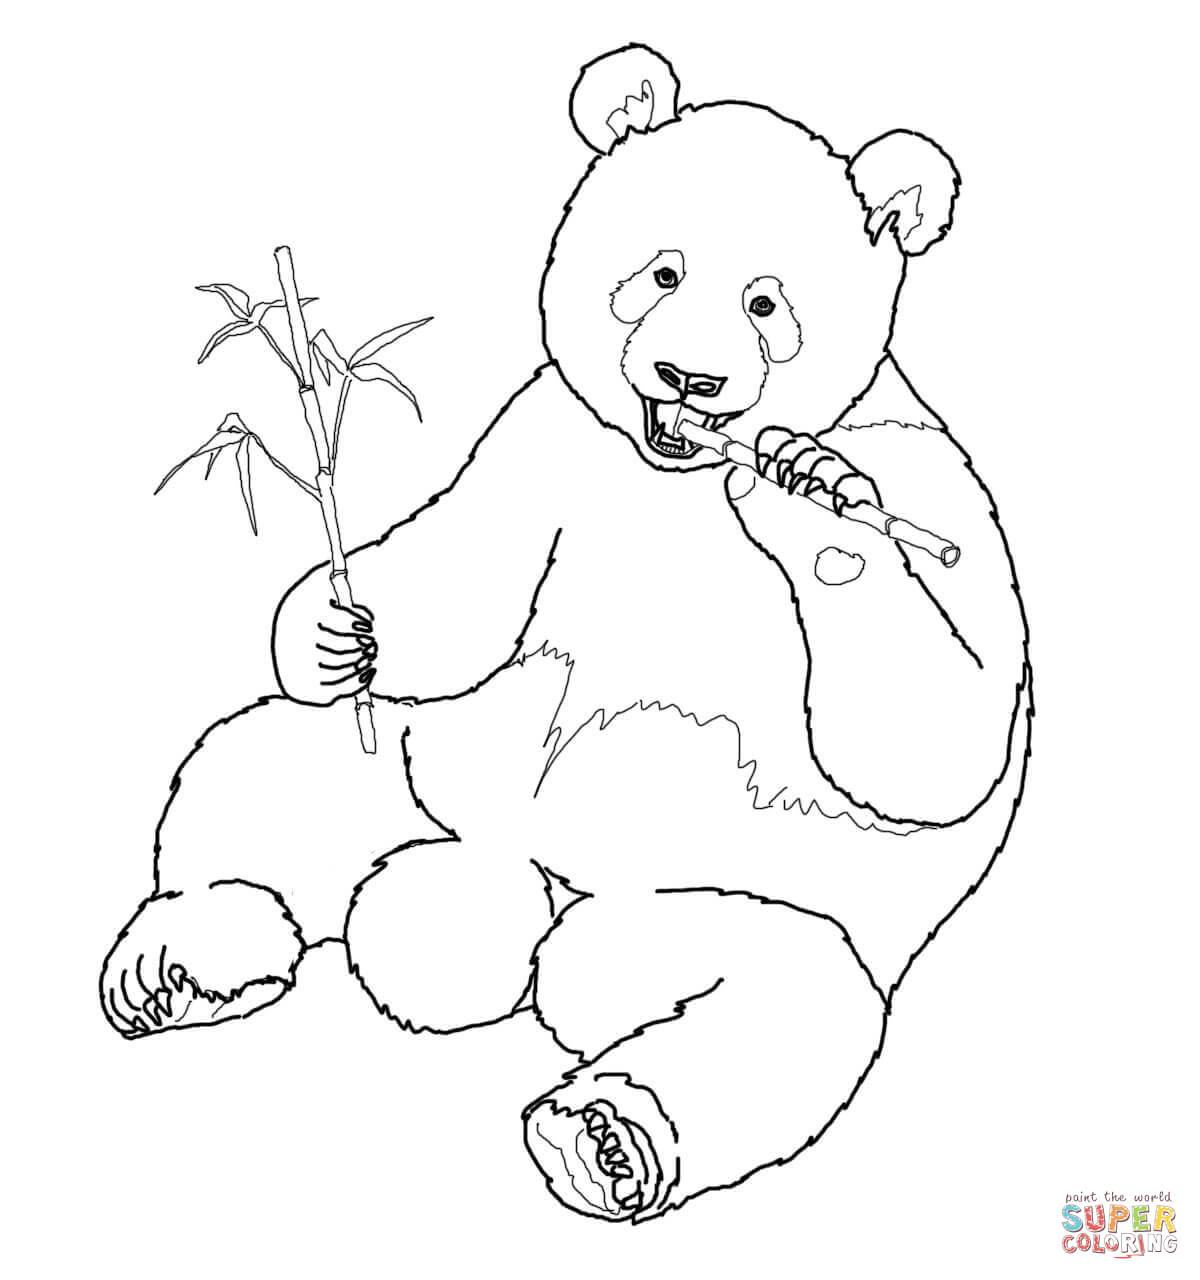 panda eating bamboo coloring pages together with panda bear coloring